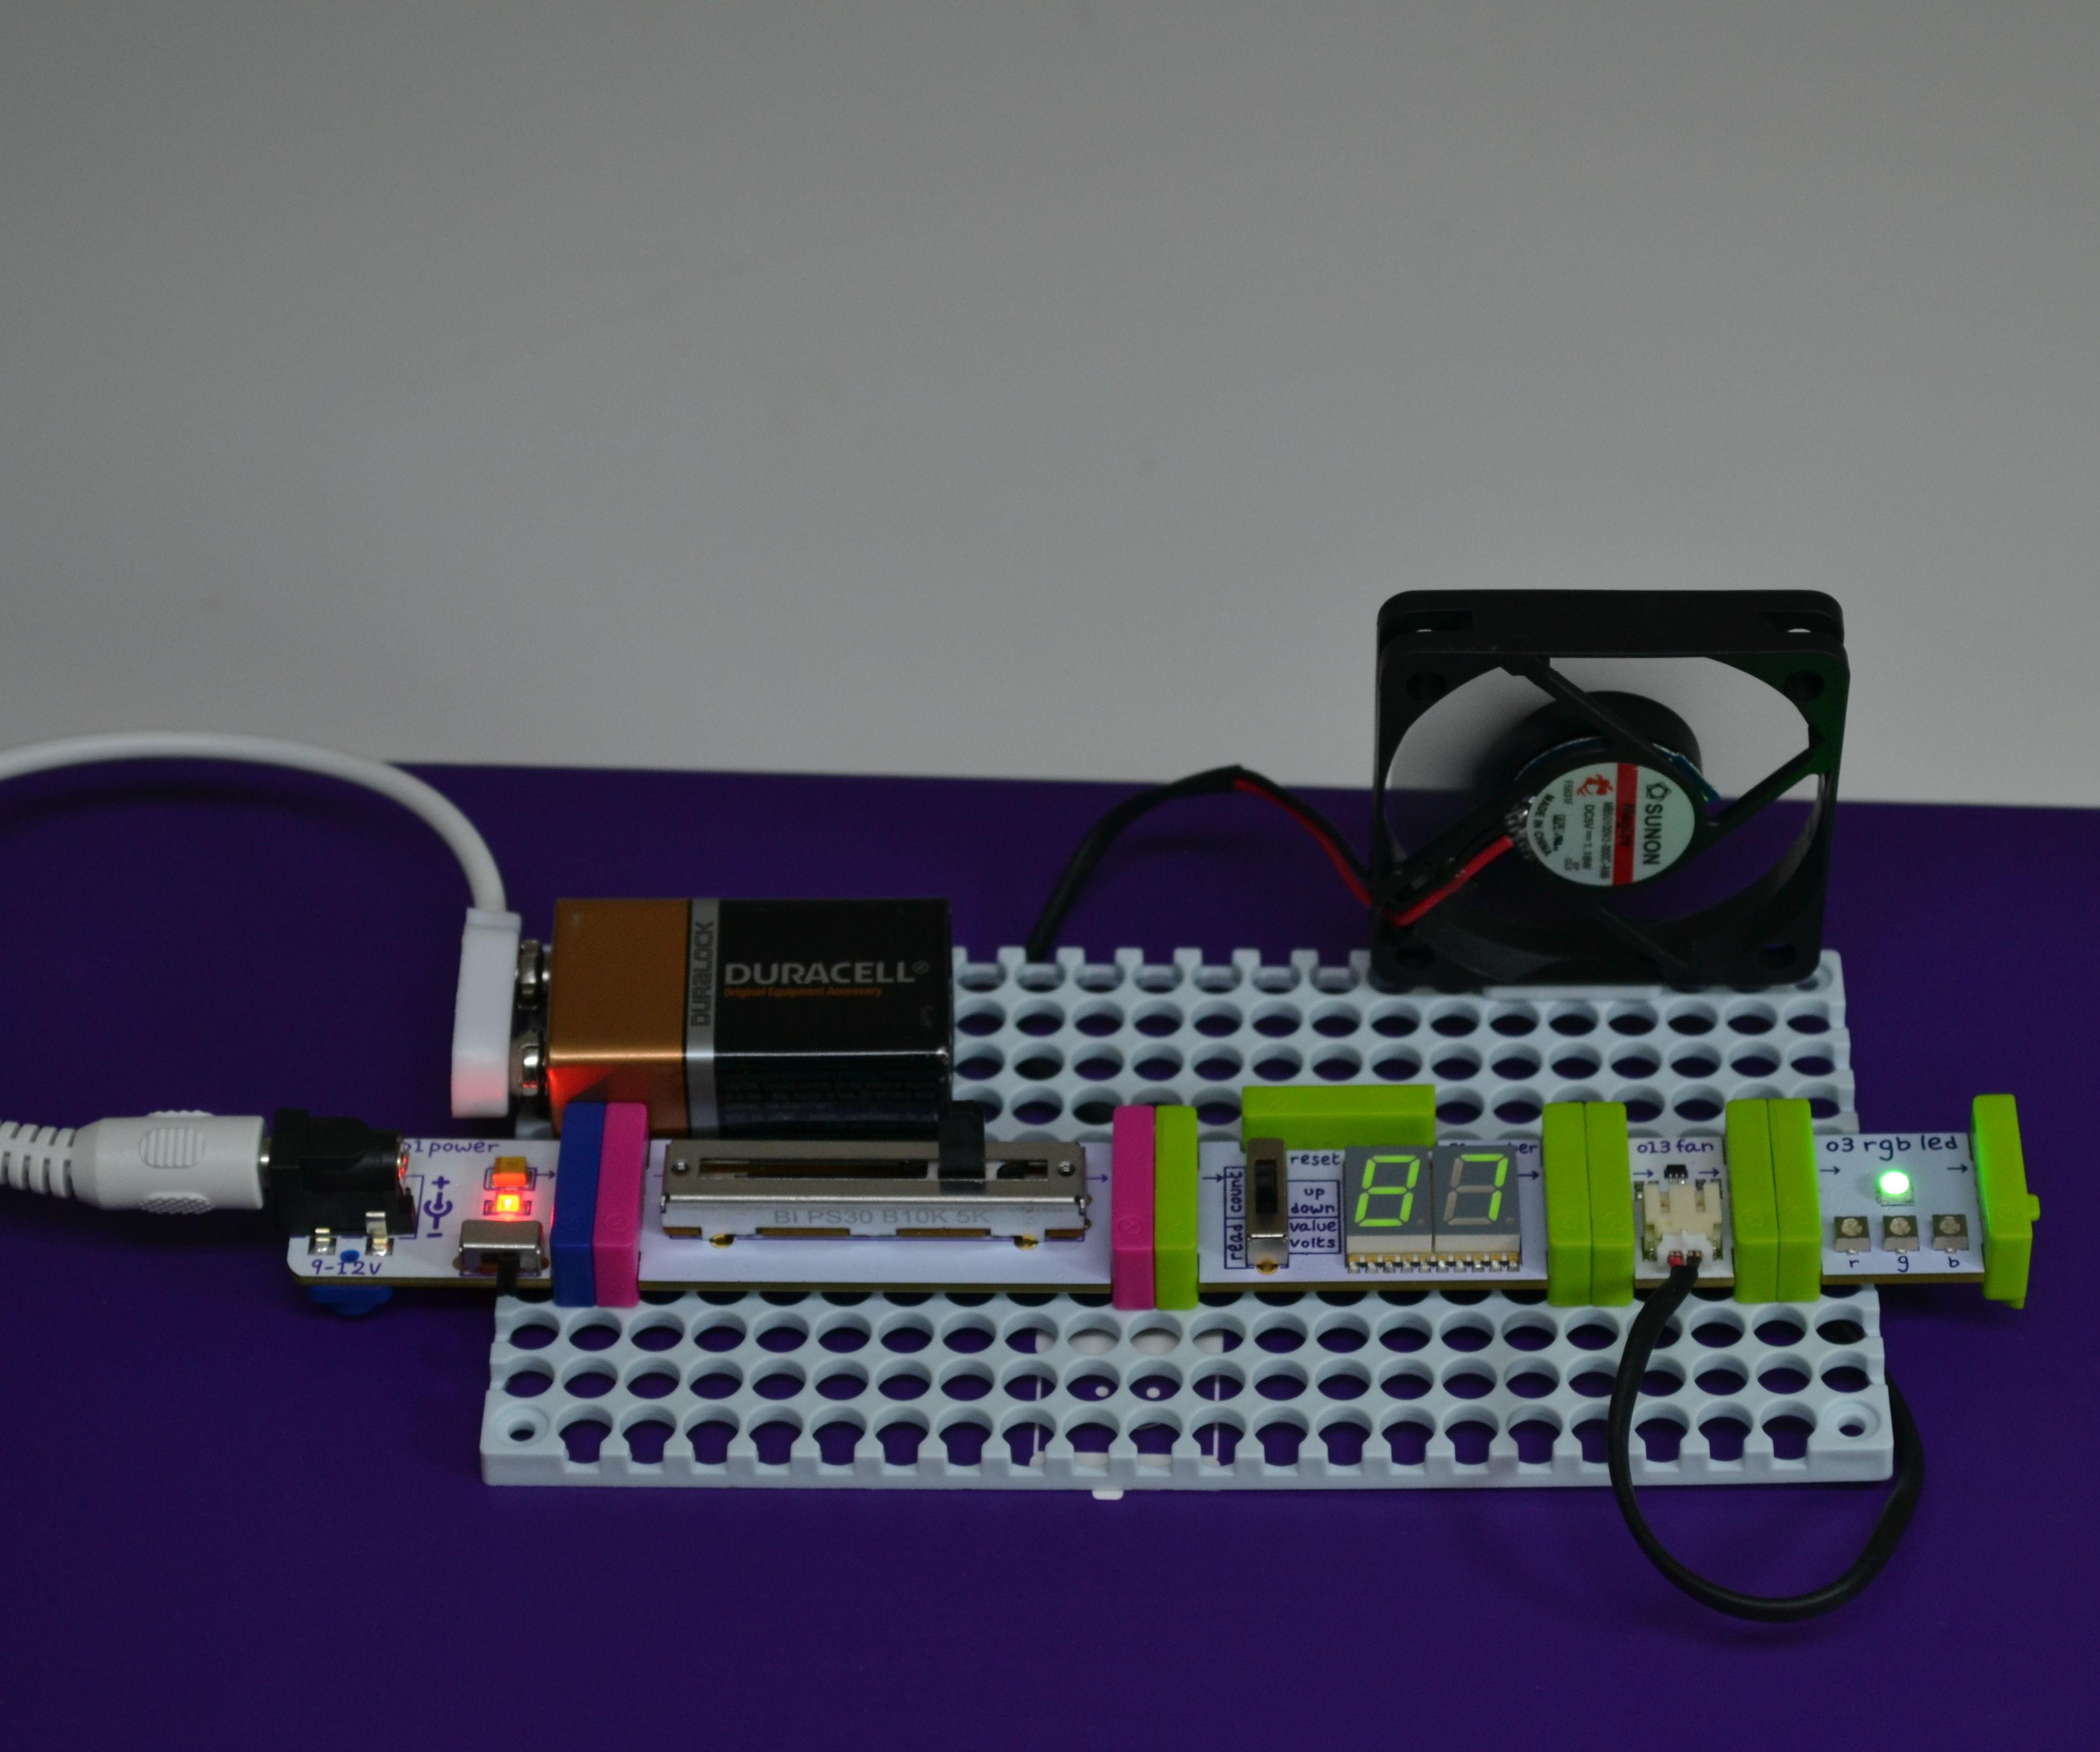 Como hacer un abanico con iluminación utilizando littlebits